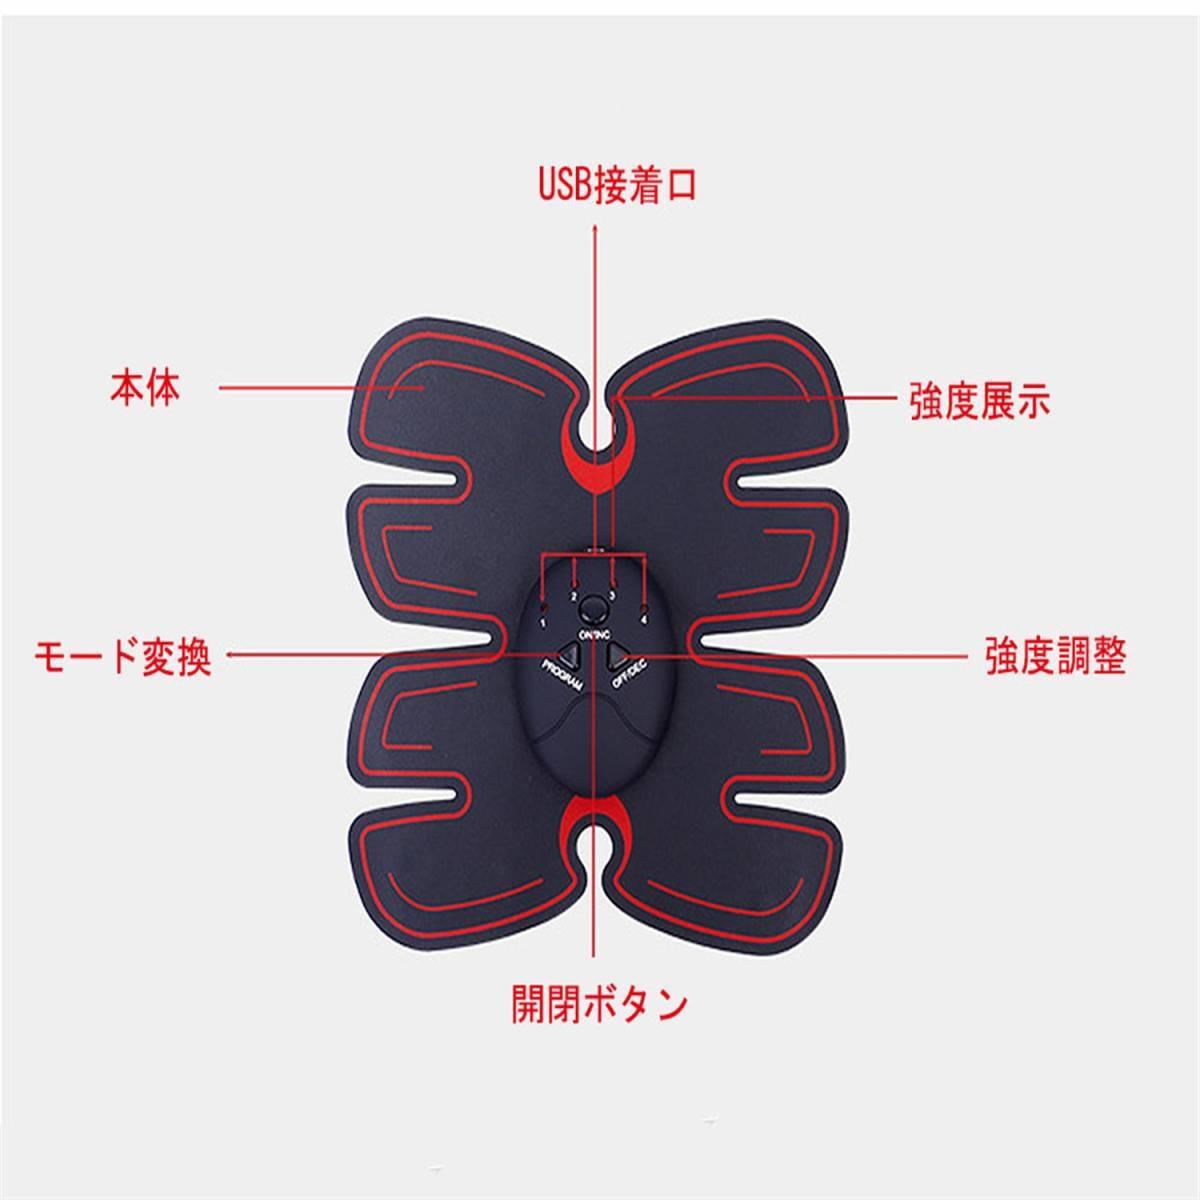 EMS 腹筋ベルト 腹筋マシーン 腹筋パッド 太もも 腕筋 筋トレ器具 ダイエット USB充電式 マッサージ エクササイズ 男女兼用_画像2